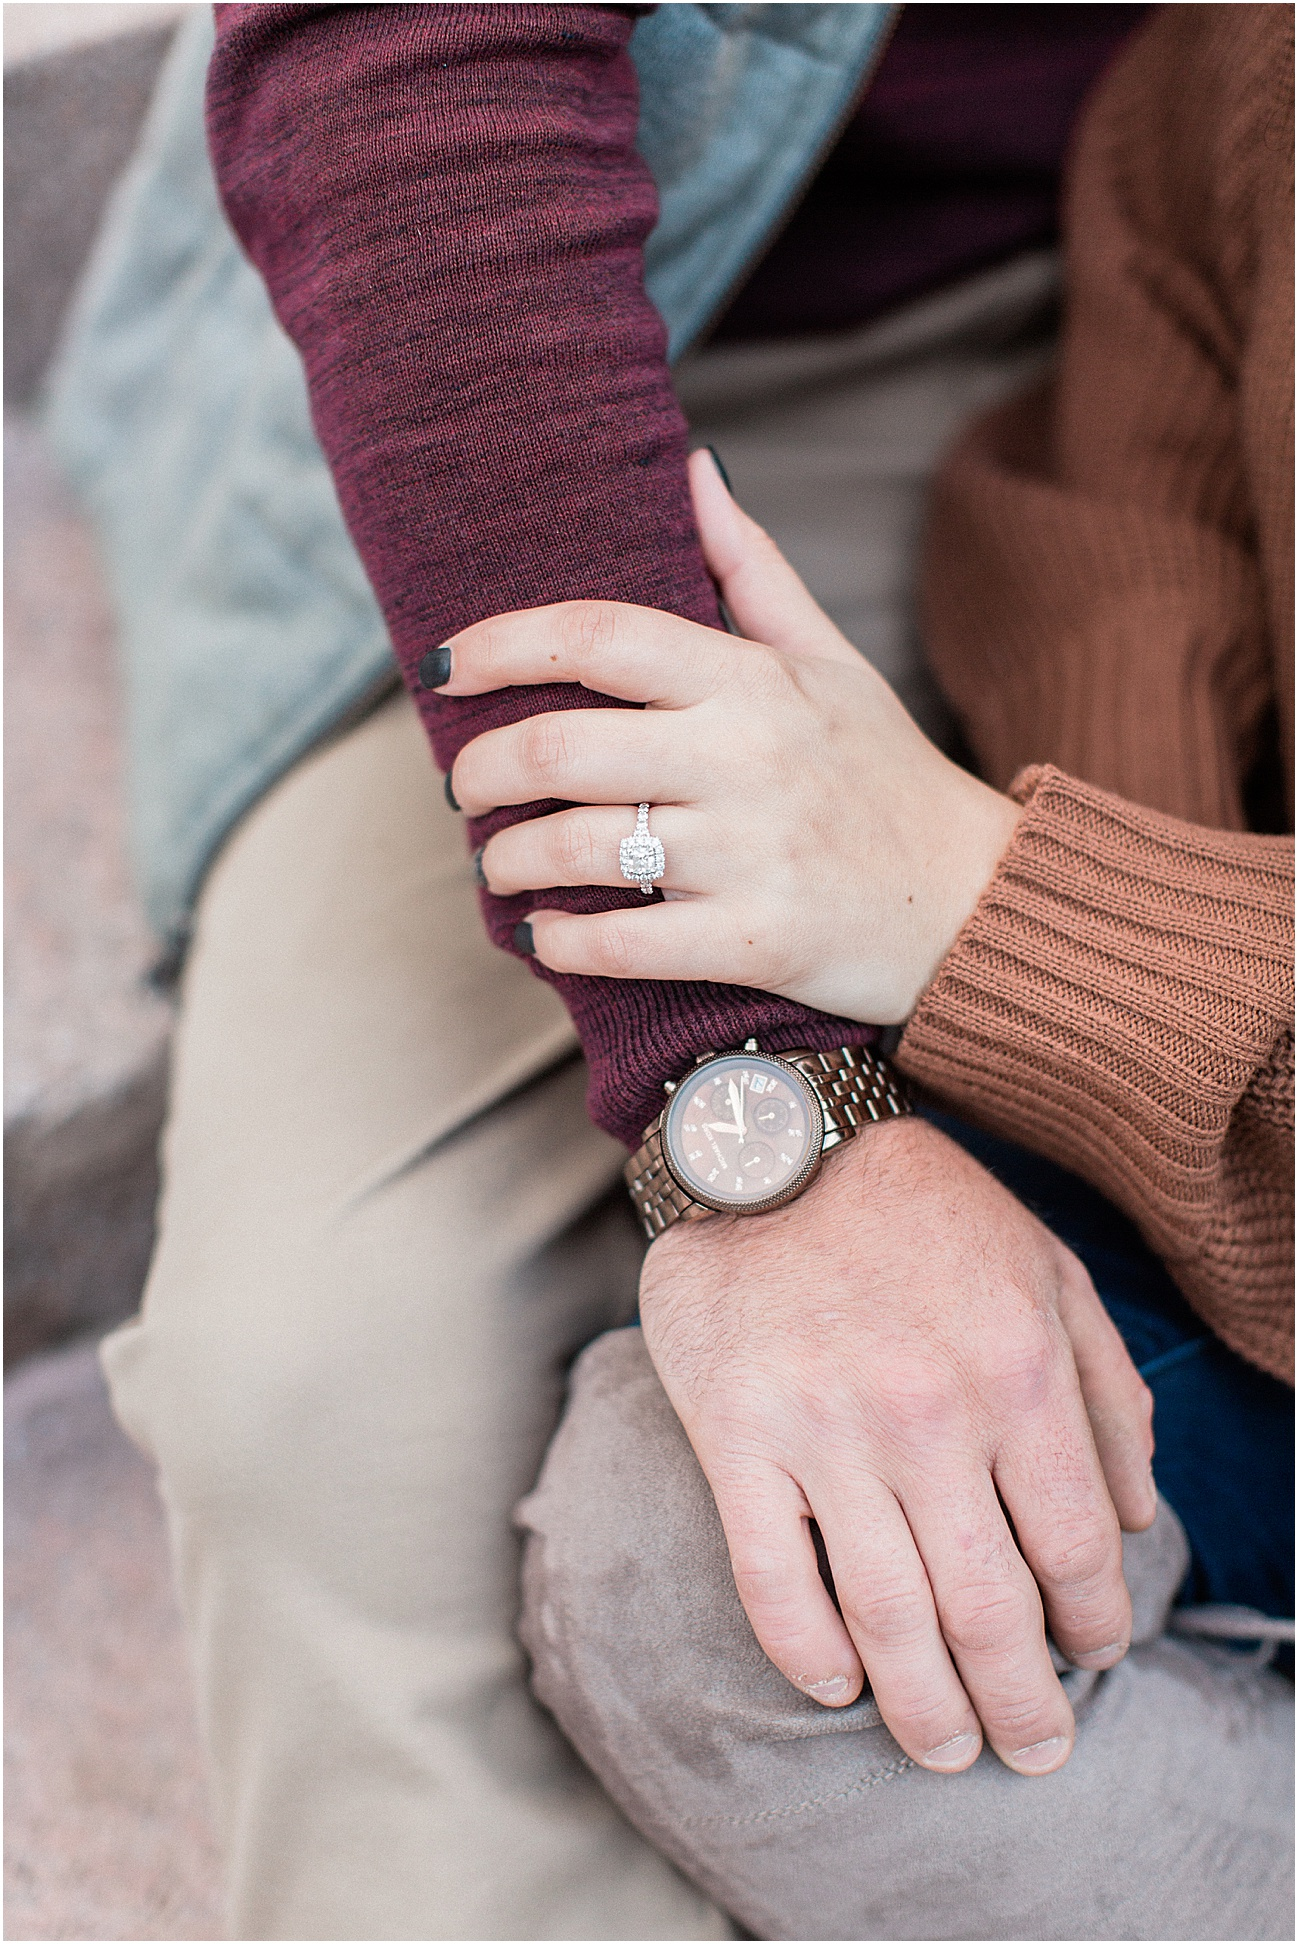 tiffany_doug_saratoga_springs_engagement_fall_cape_cod_boston_wedding_photographer_meredith_jane_photography_photo_1489.jpg